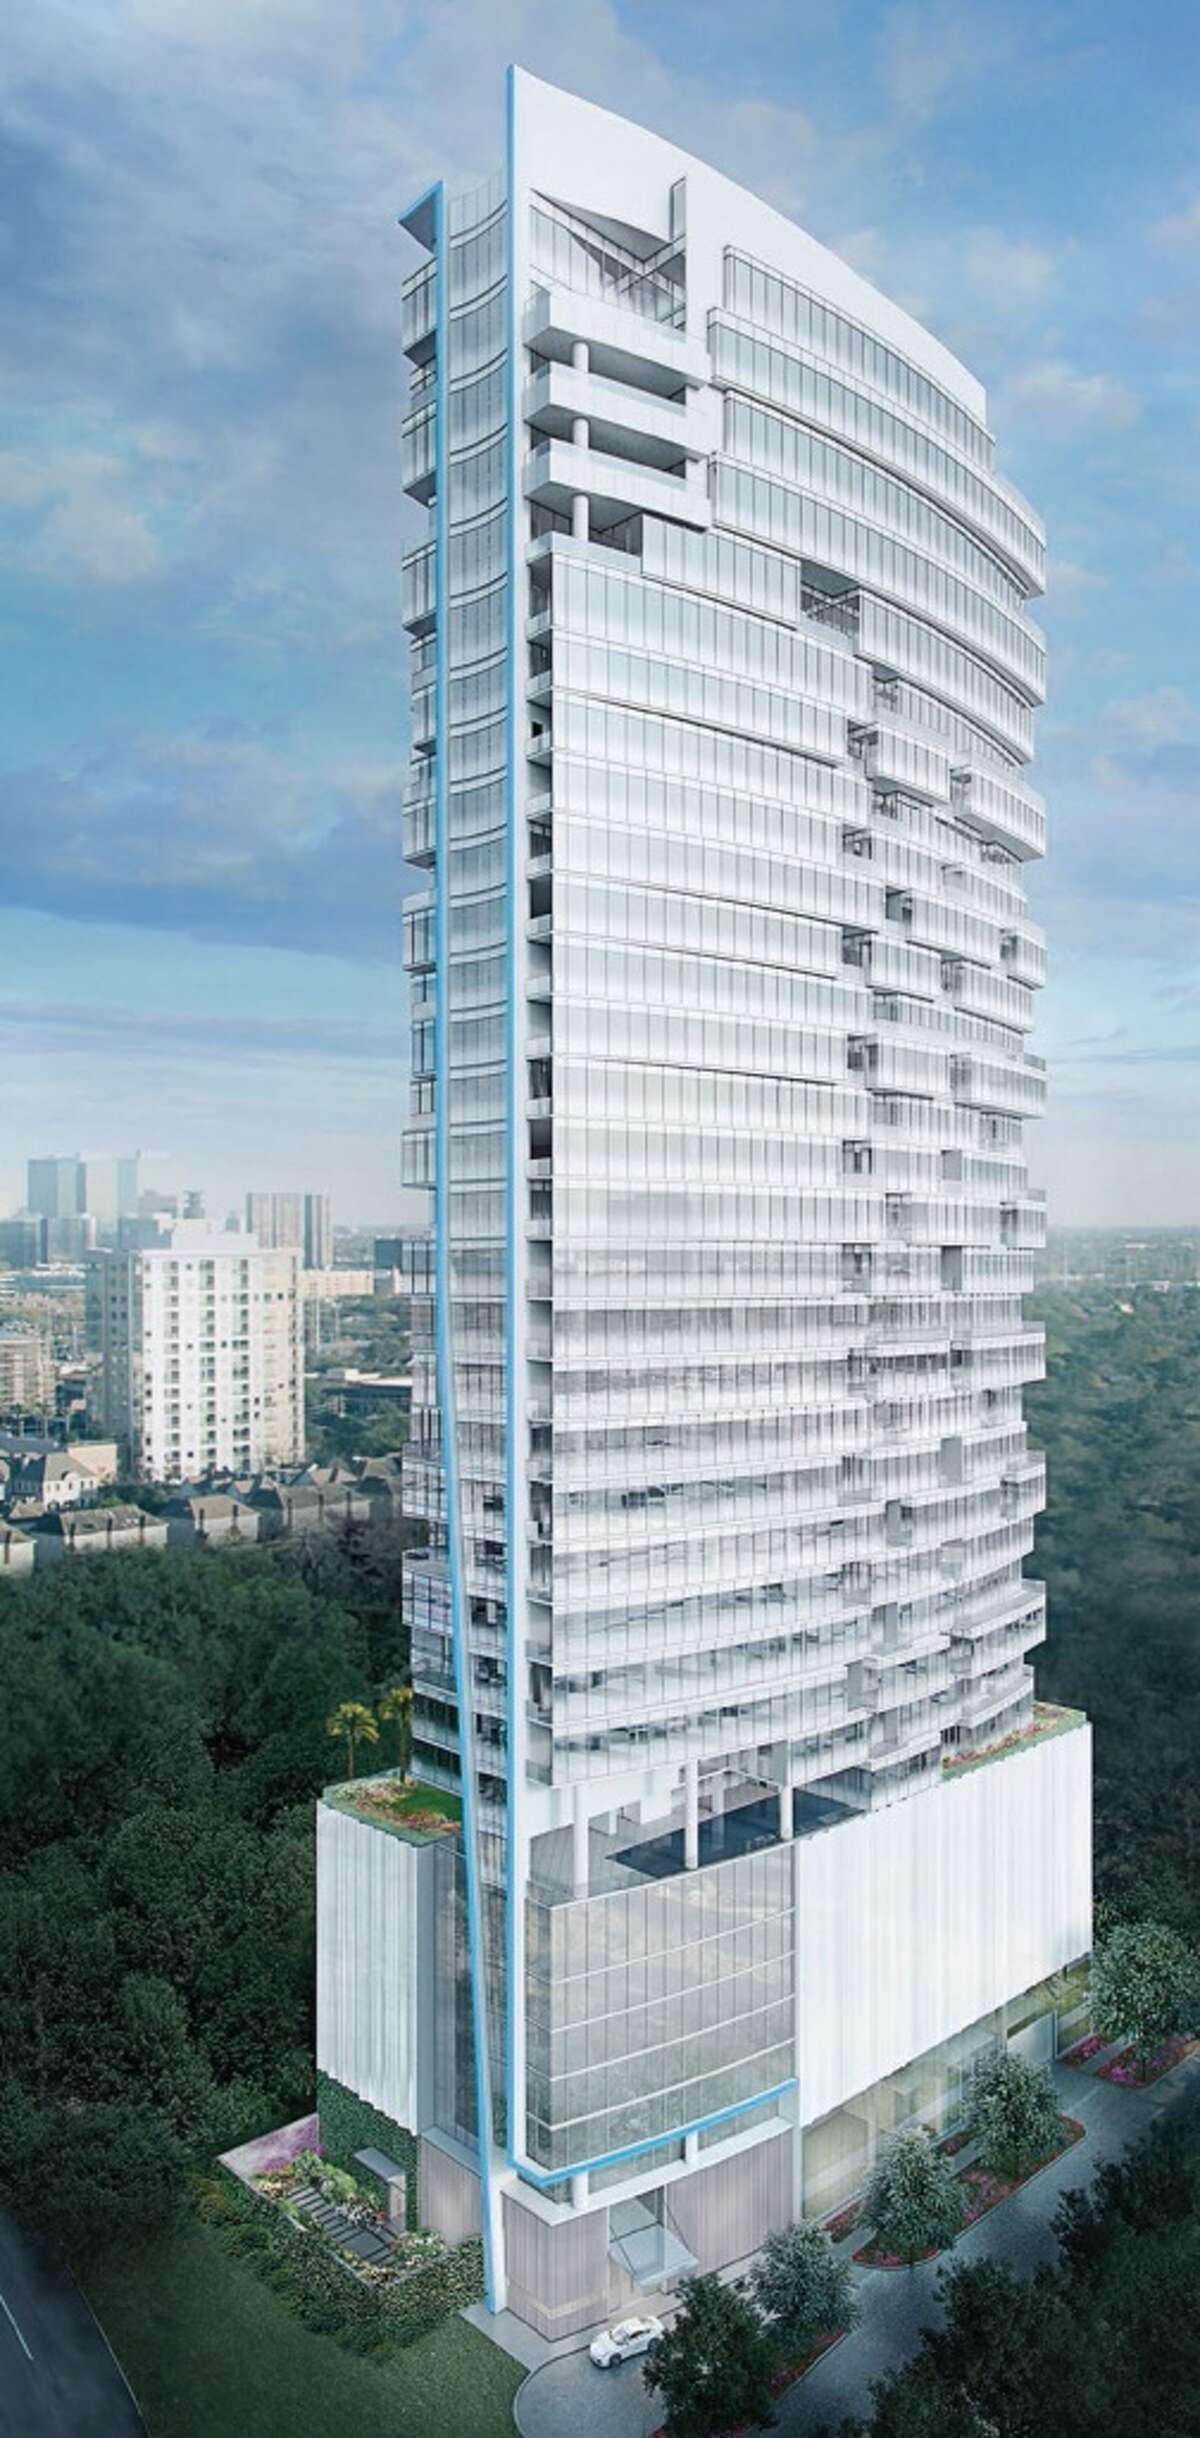 Arabella -4521 San Felipe Street Stories tall:33 Height:399 ft Building function:Residential Source:Skyscrapercenter.com